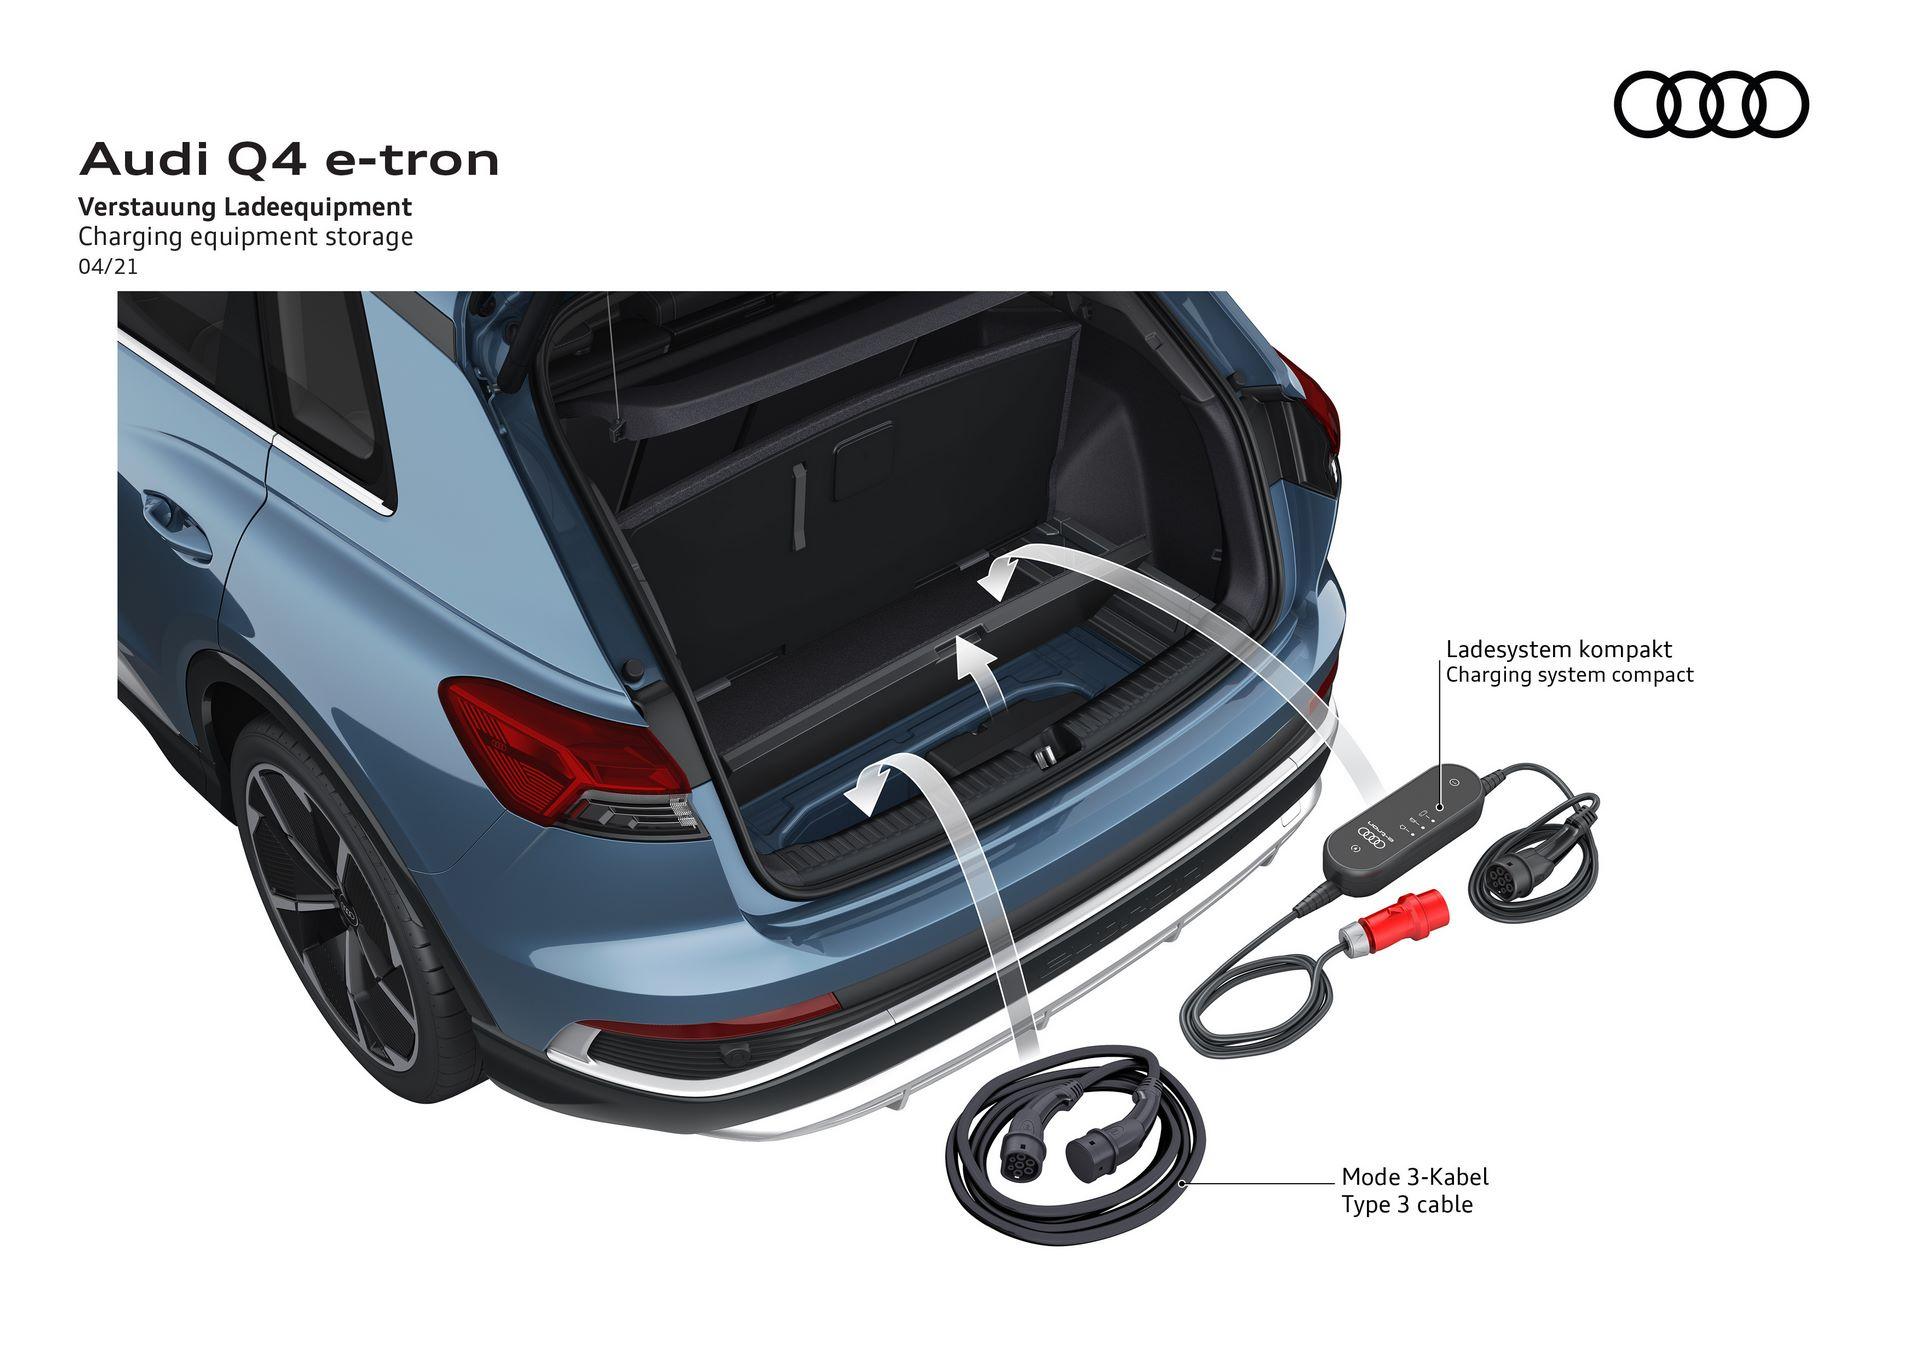 Audi-Q4-e-tron-and-Q4-e-tron-Sportback-106